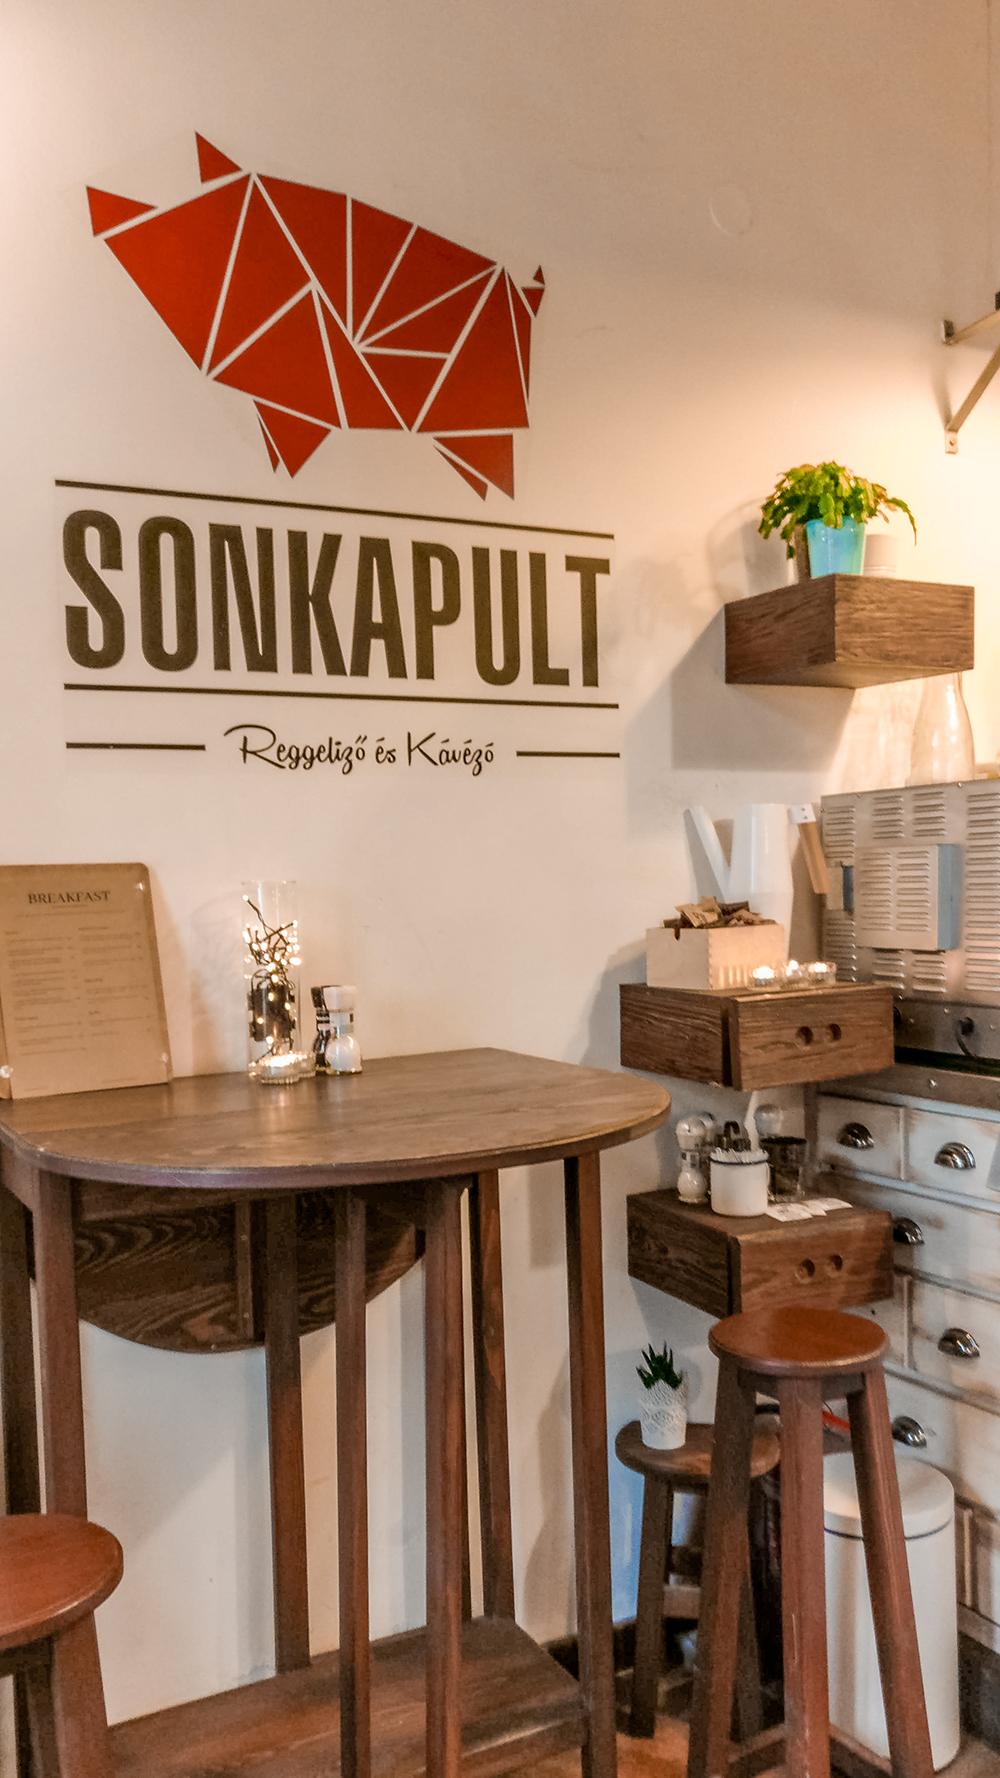 Sonkapult - Budapest's best breakfast & brunch places in the centre - Deák Ferenc square and Astoria | Aliz's Wonderland